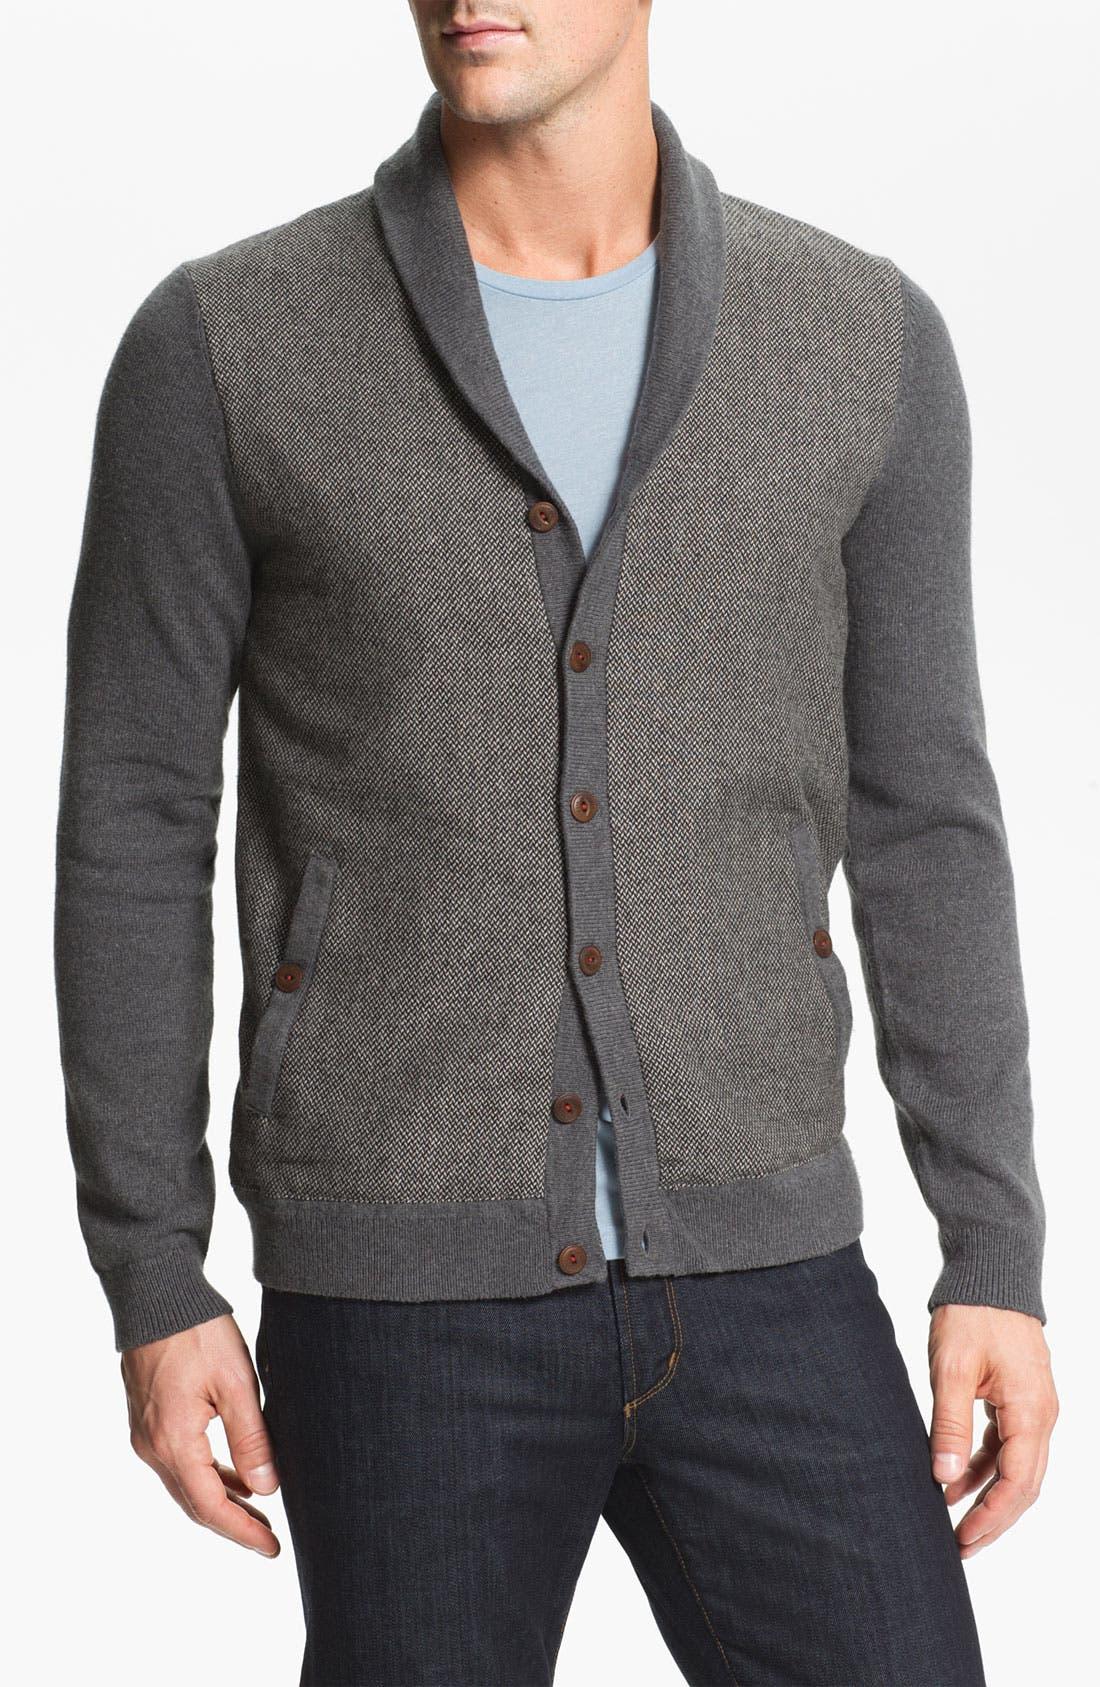 Alternate Image 1 Selected - Ted Baker London 'Bosport' Shawl Collar Button Cardigan